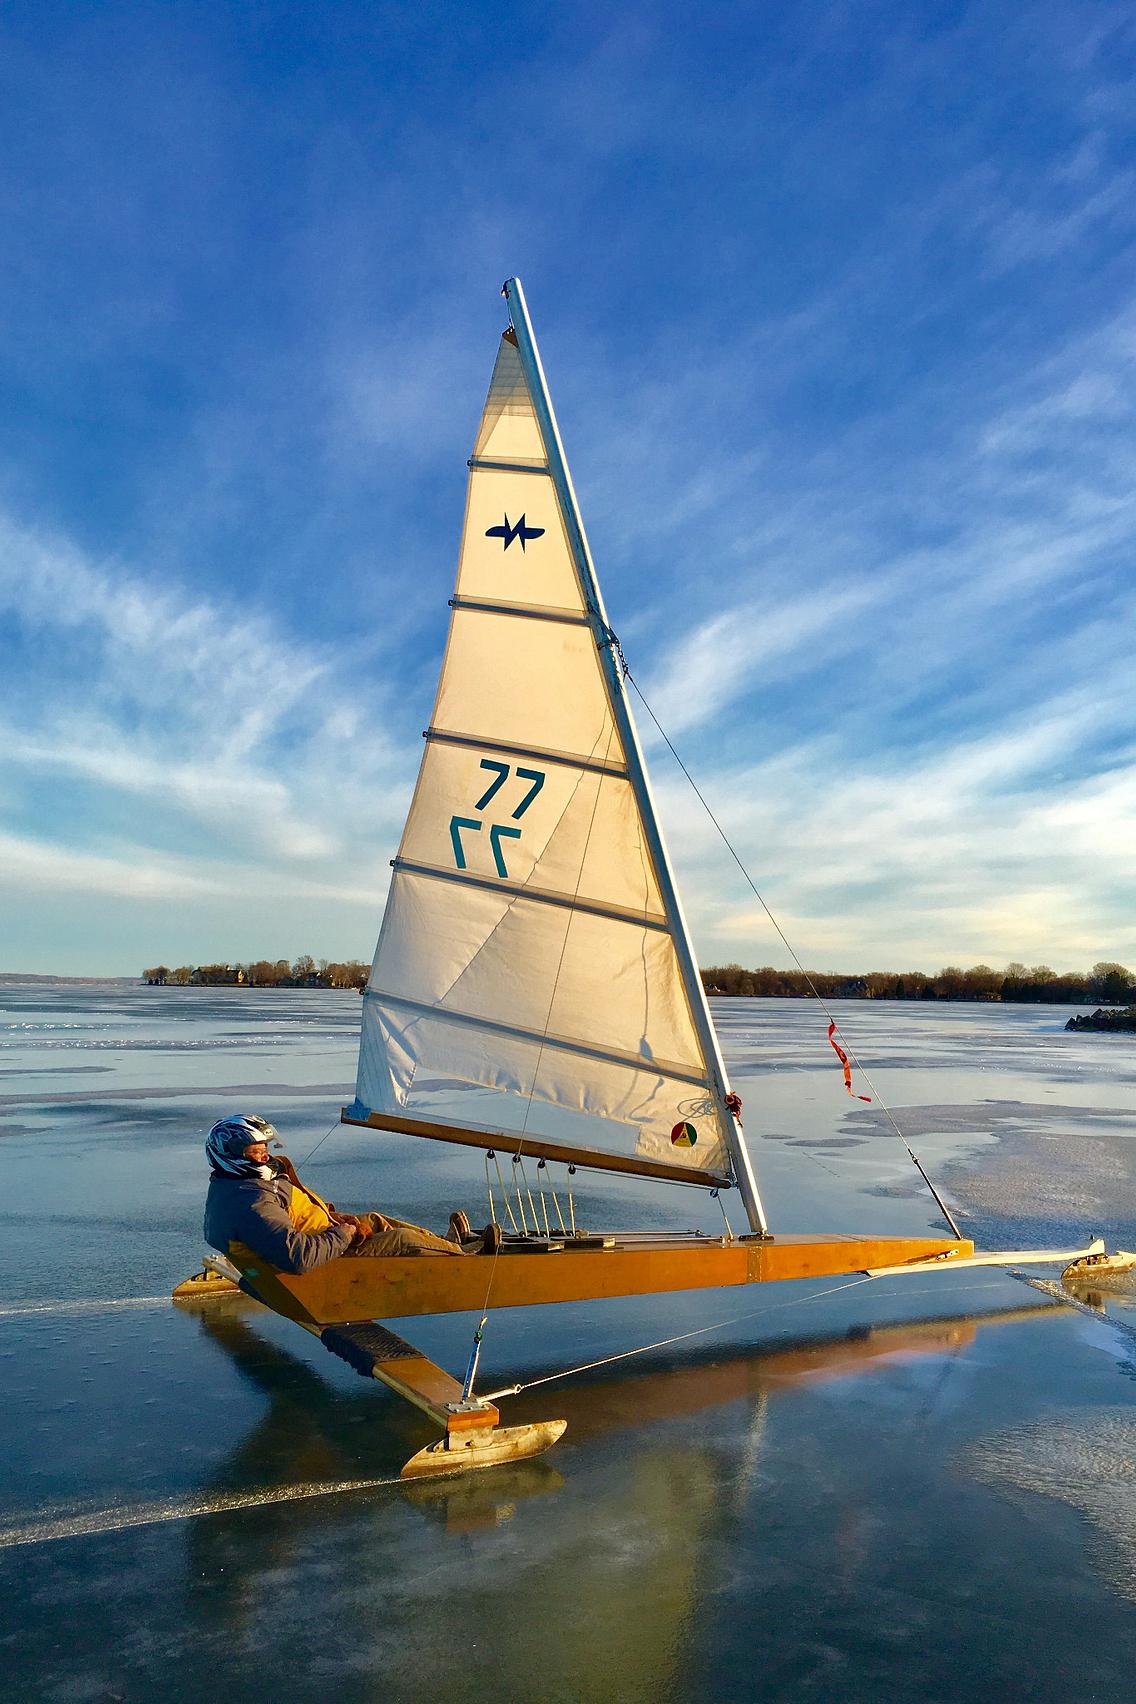 Ice boat gliding across Lake Winnebago